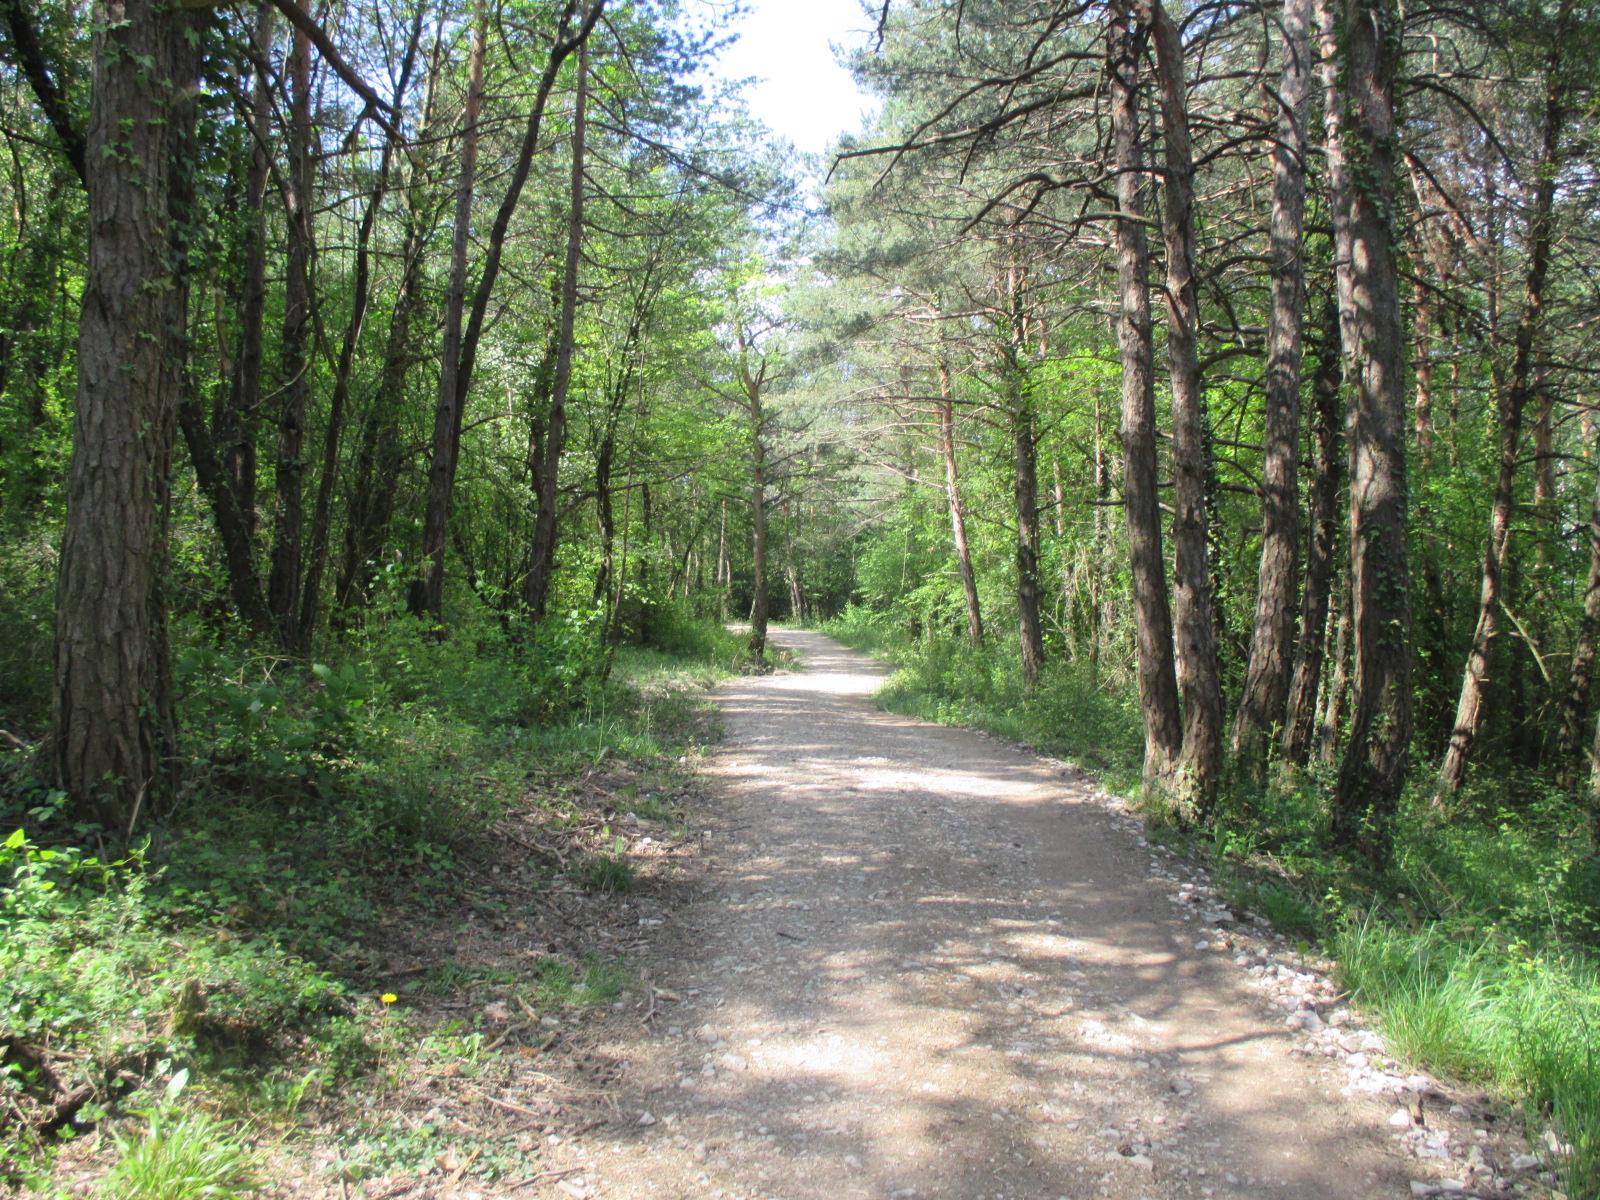 1 – RONCESVALLES-ZUBIRI  (22 km)